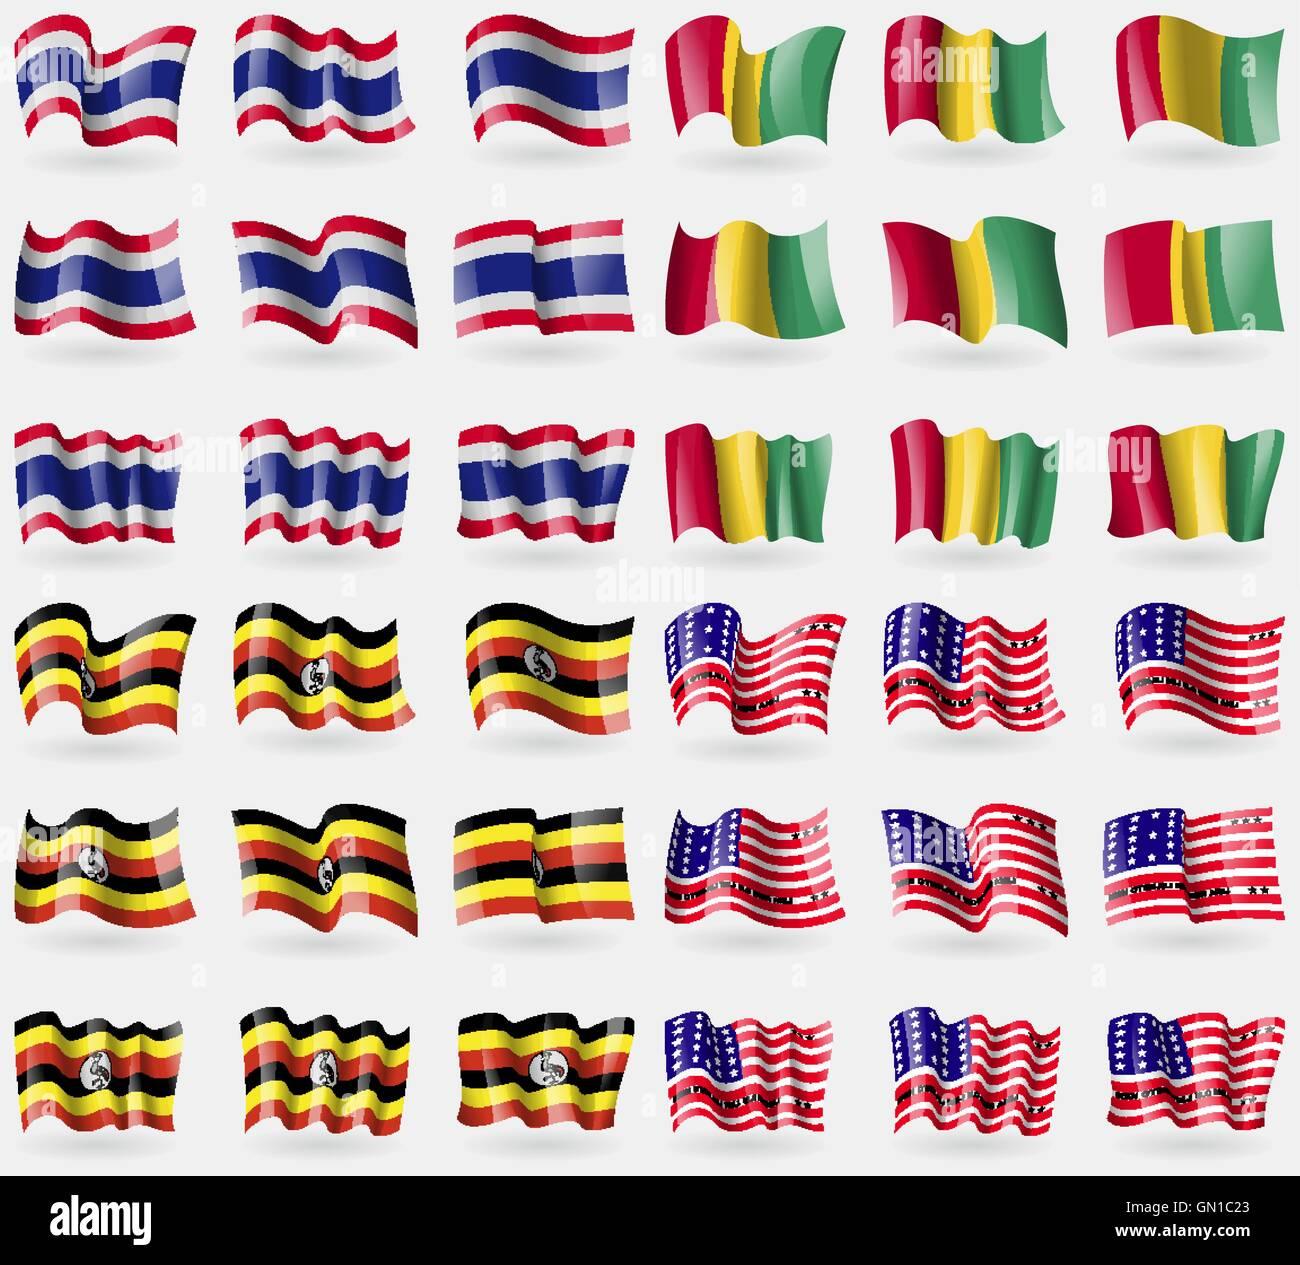 Thailand, Guinea, Uganda, Bikini Atoll. Set of 36 flags of the countries of the world. Vector - Stock Image